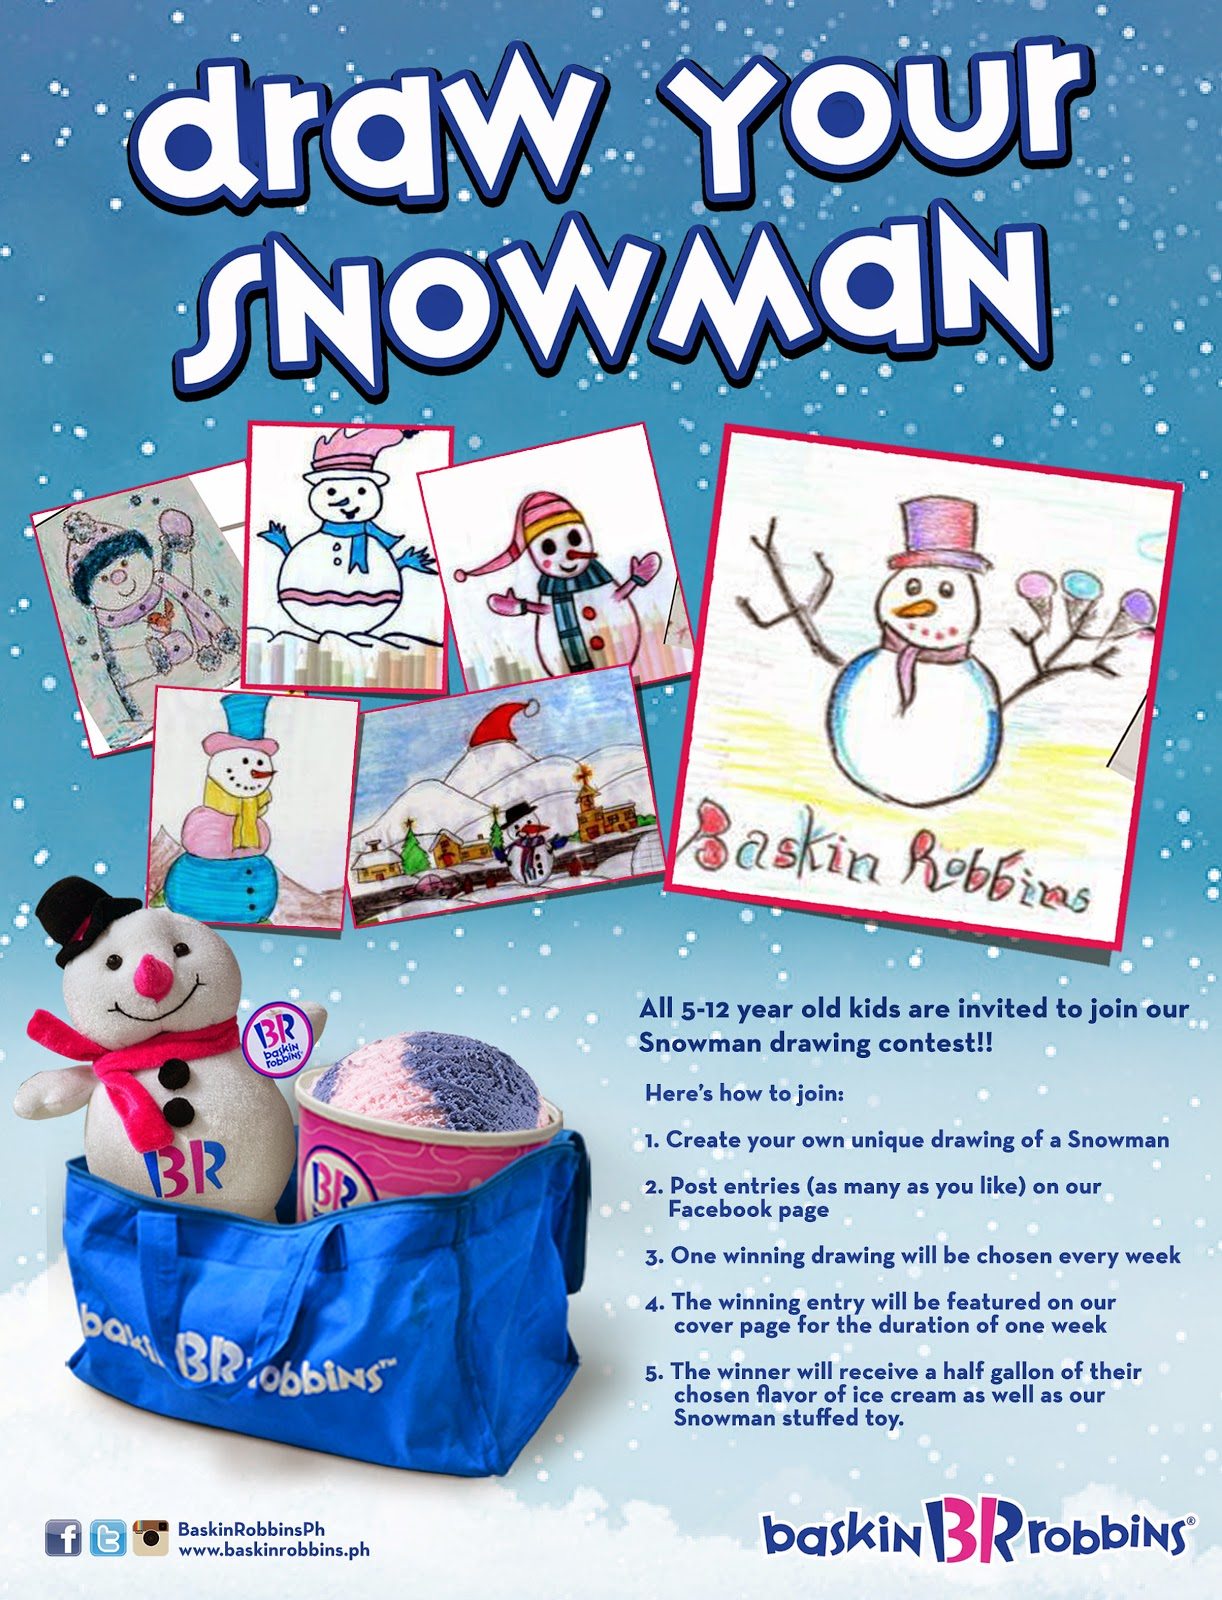 Timeless Confection Tous Les Jours Strawberry Fresh Cream Cake 2 E Voucher Baskin Robbins Philippines Draw Your Snowman Promo